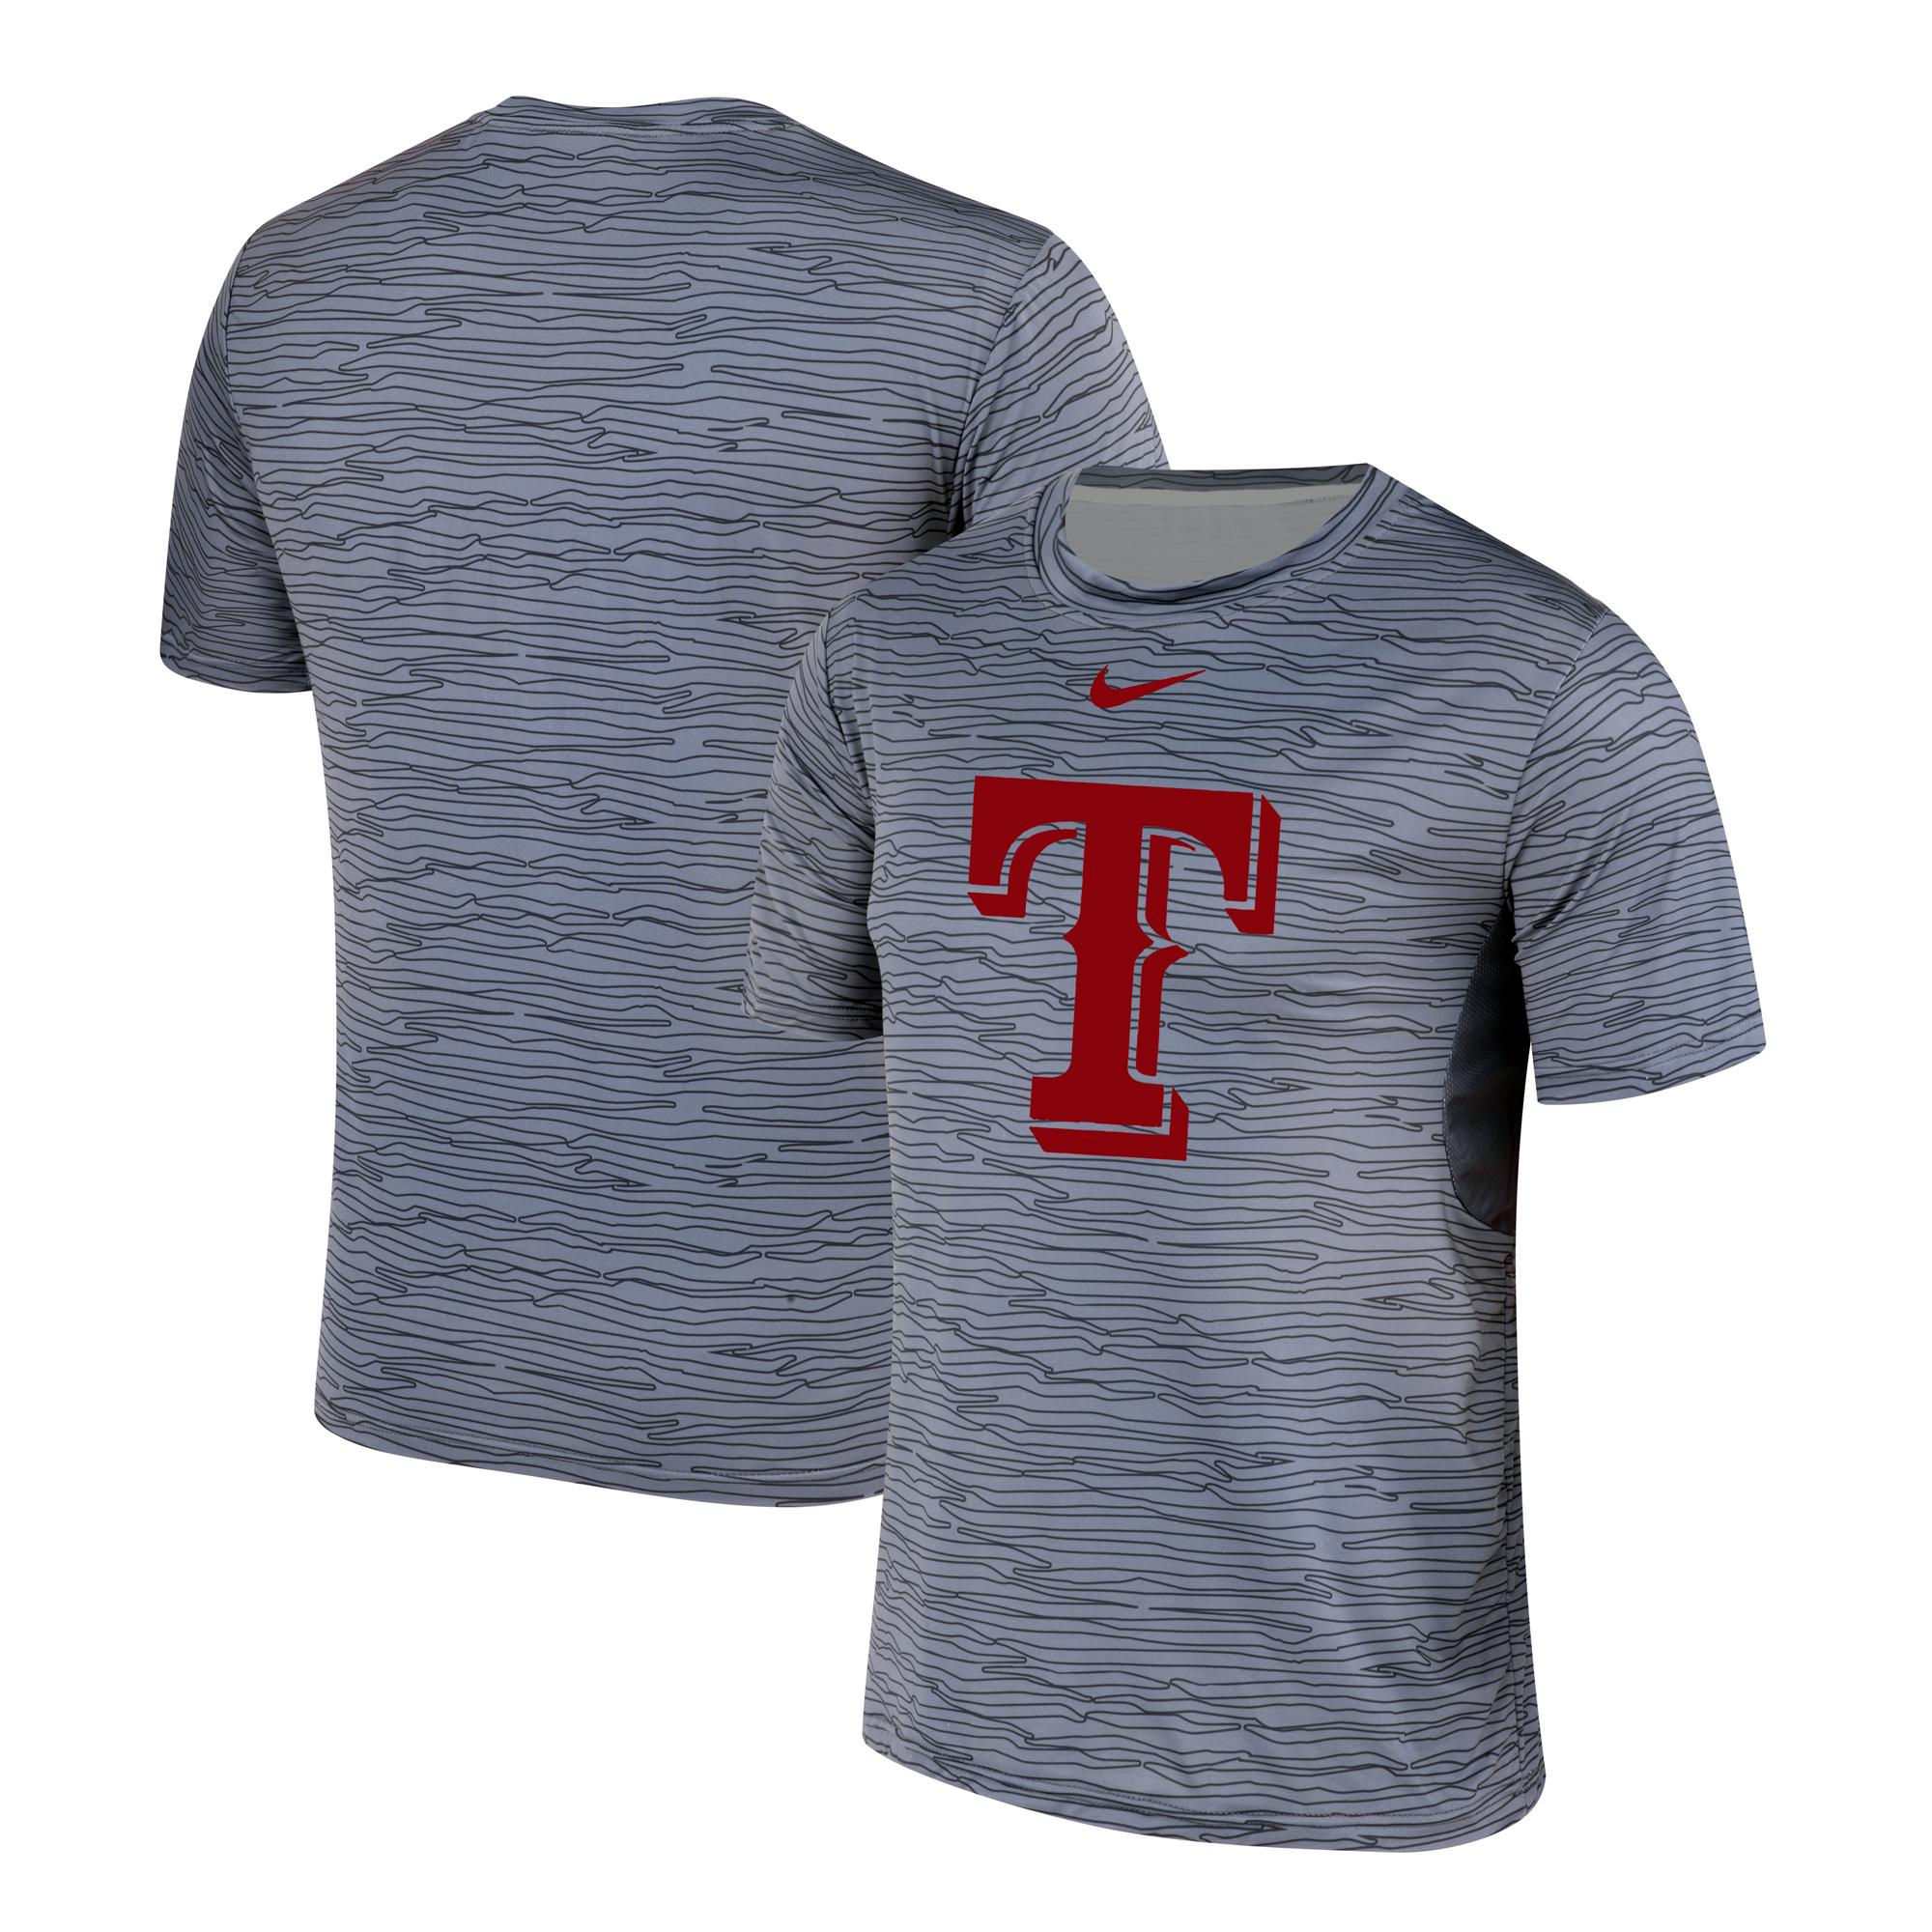 Nike Texas Rangers Gray Black Striped Logo Performance T-Shirt